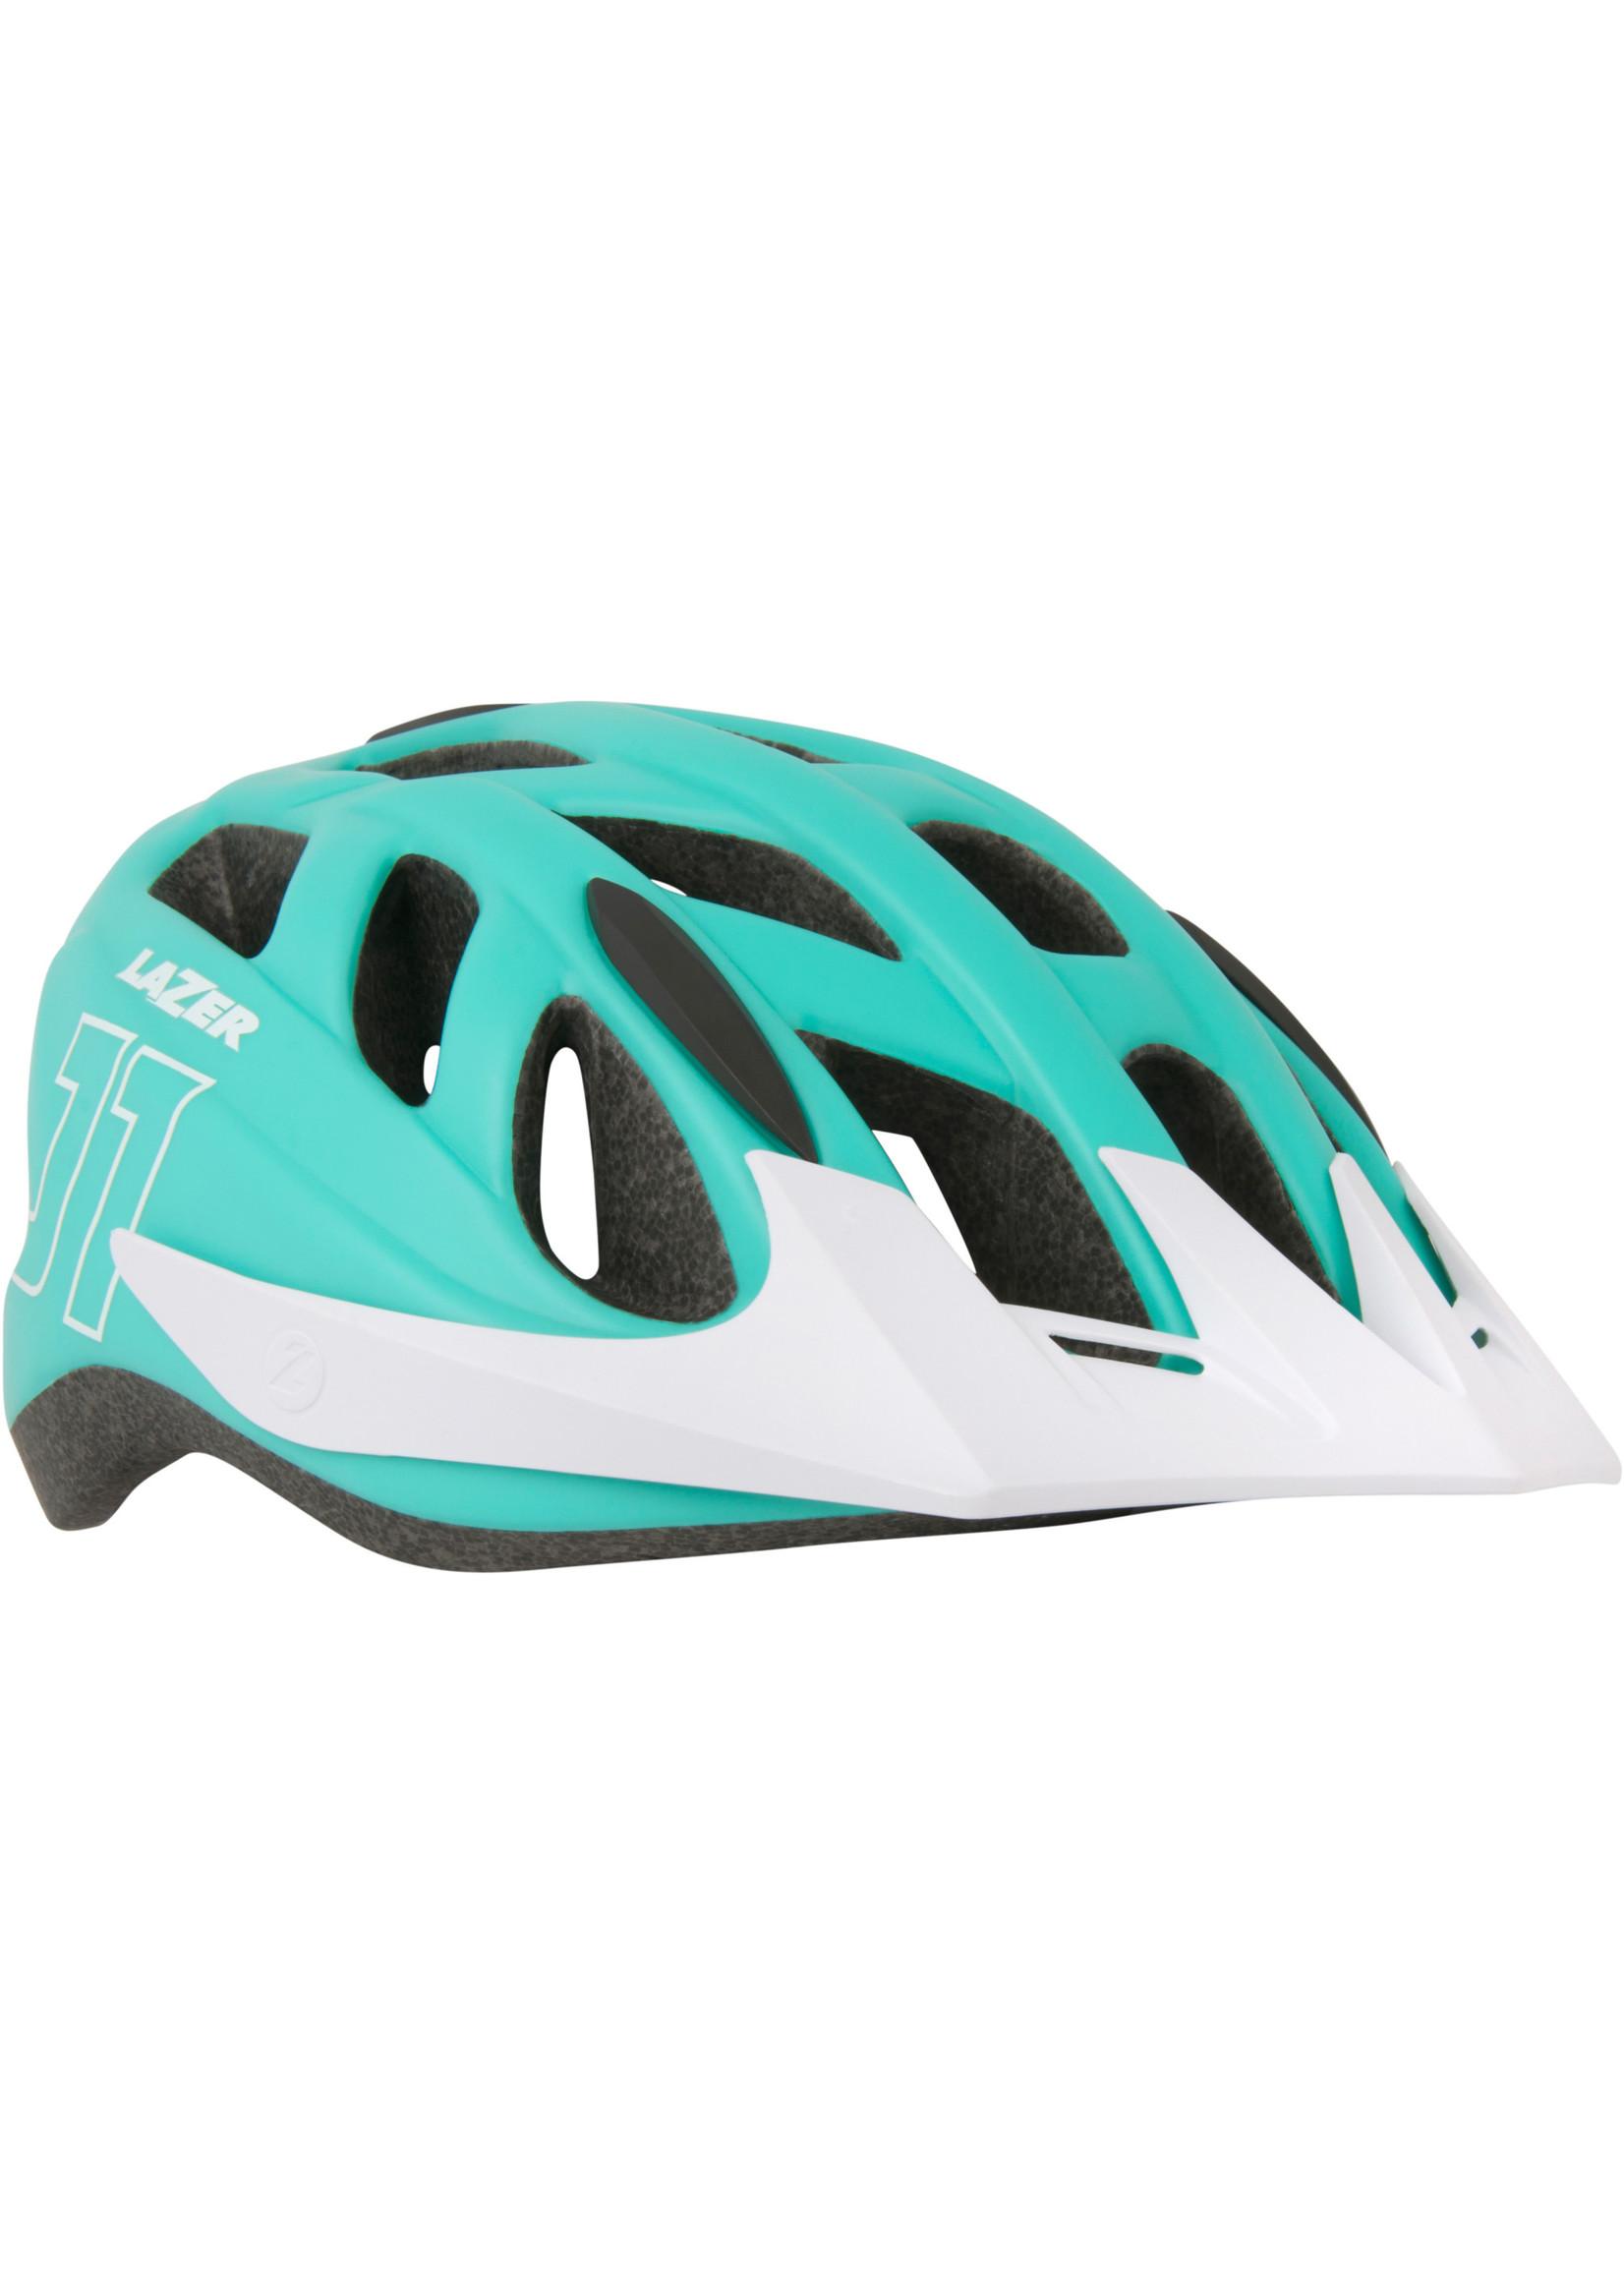 Lazer J1 Helmet, Mint Green/White, Uni-Youth